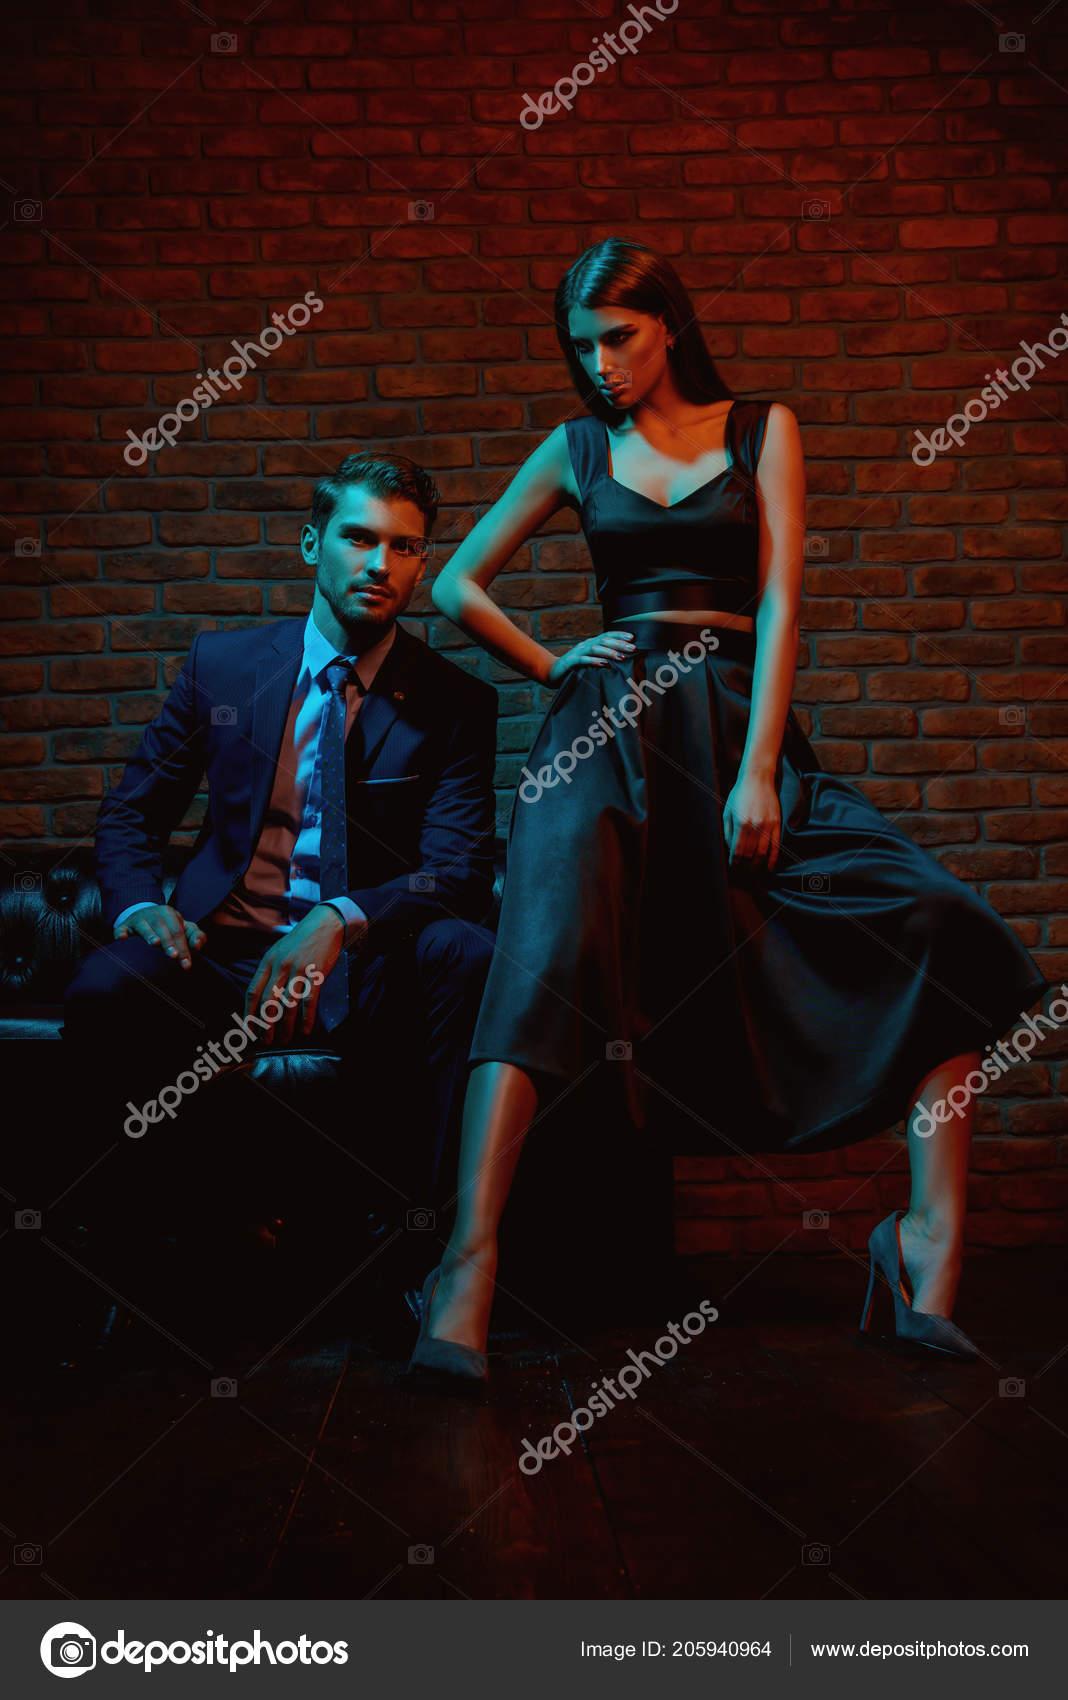 Mode Avondjurken.Seksuele Gepassioneerd Paar Elegante Avondjurken Luxe Interieur Mode